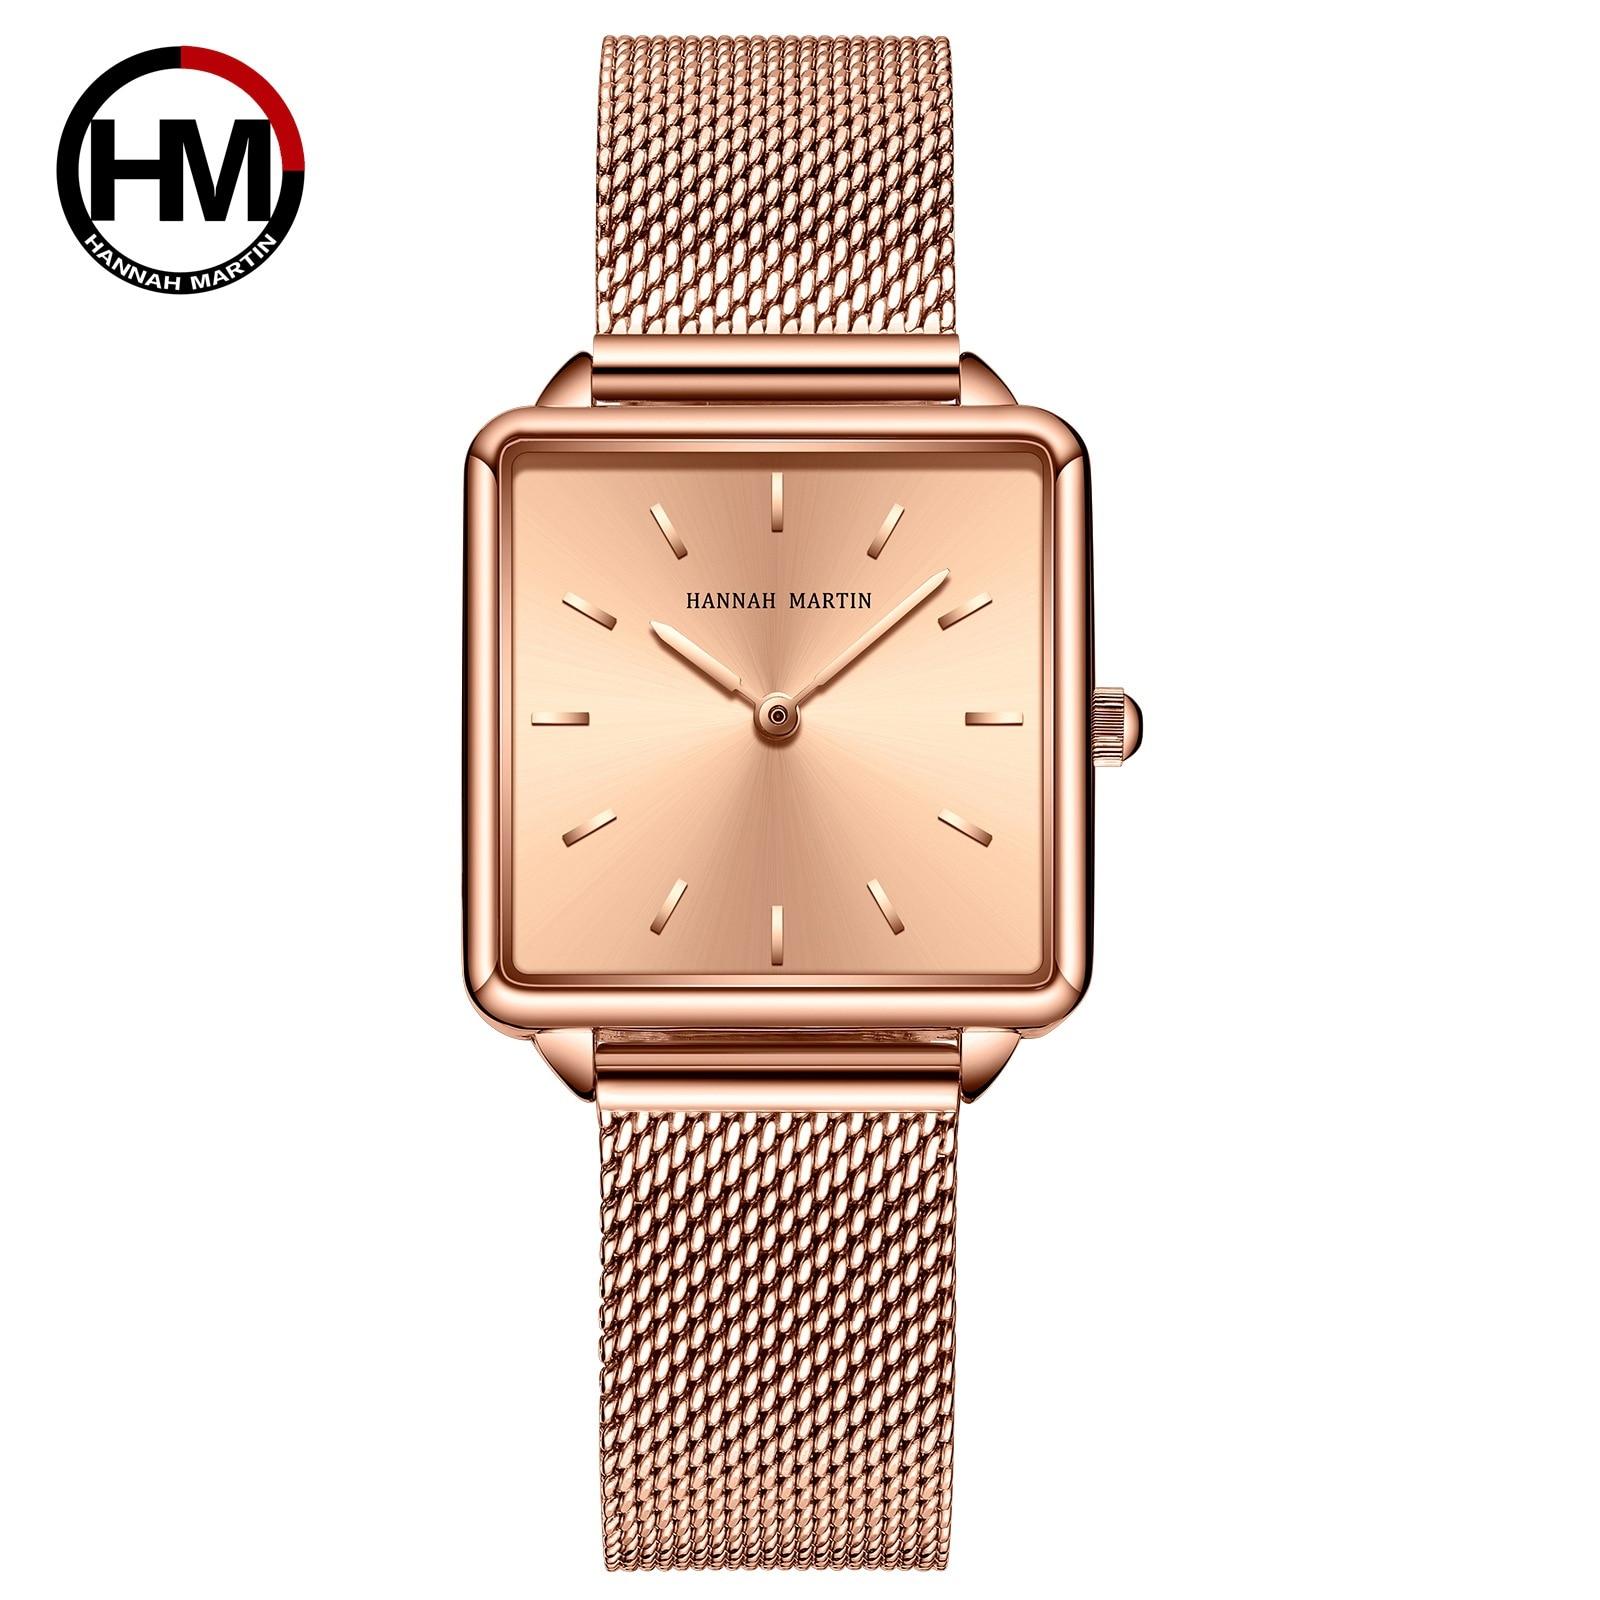 Hannah Martin Japan Movement Women Rose Gold Watches Simple Fashion Casual Watch Luxury Ladies Square Watch Relogio Feminino